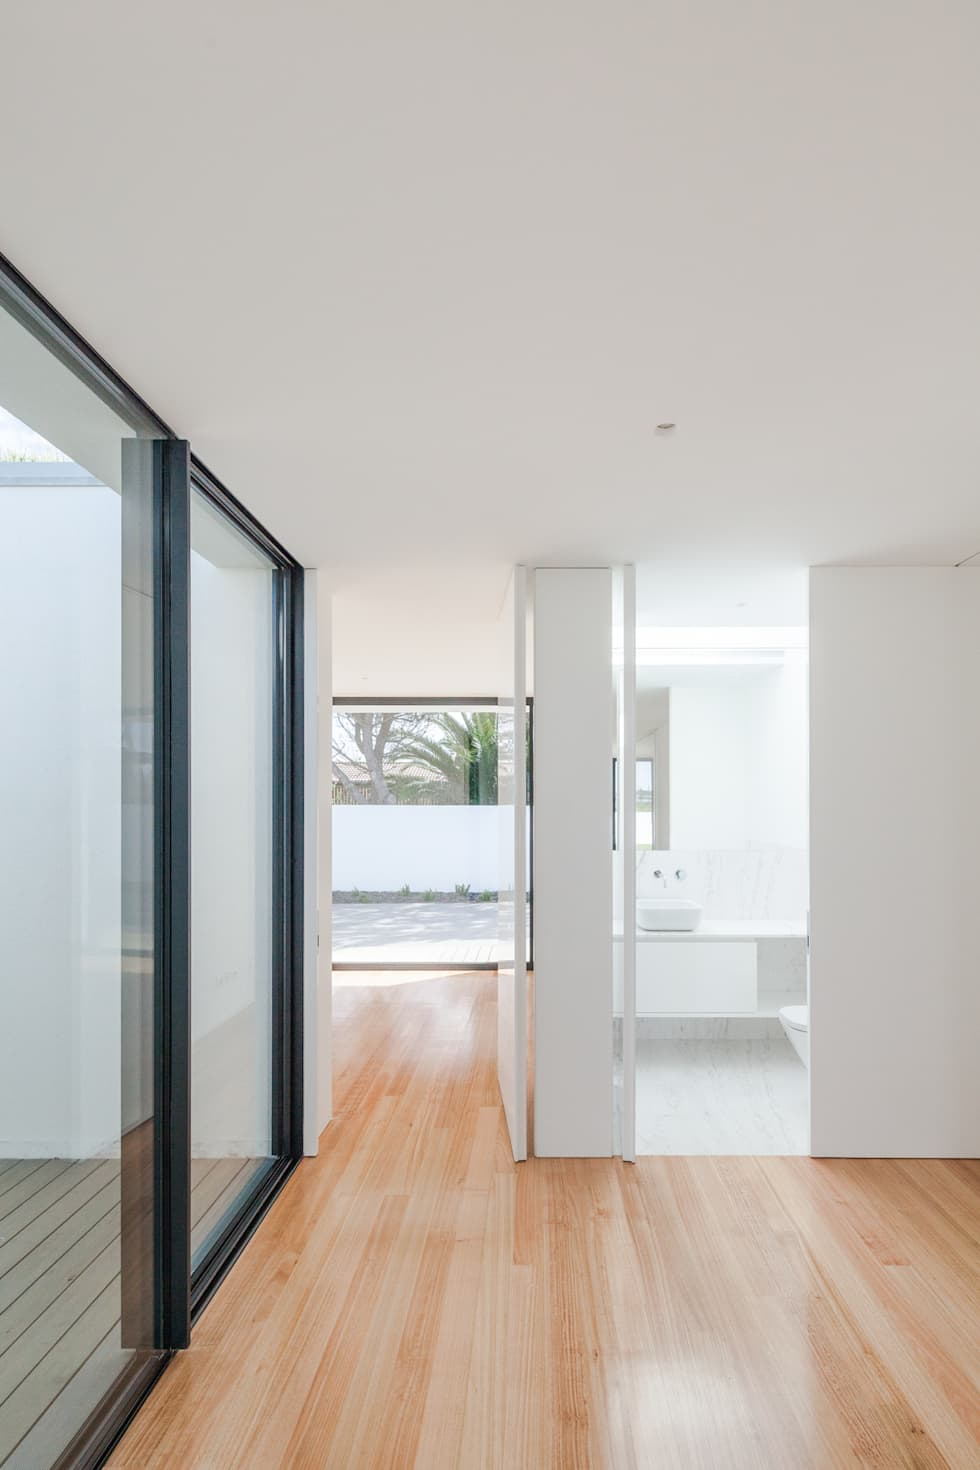 Casa em Gandra - Raulino Silva Arquitecto: Corredores e halls de entrada  por Raulino Silva Arquitecto Unip. Lda